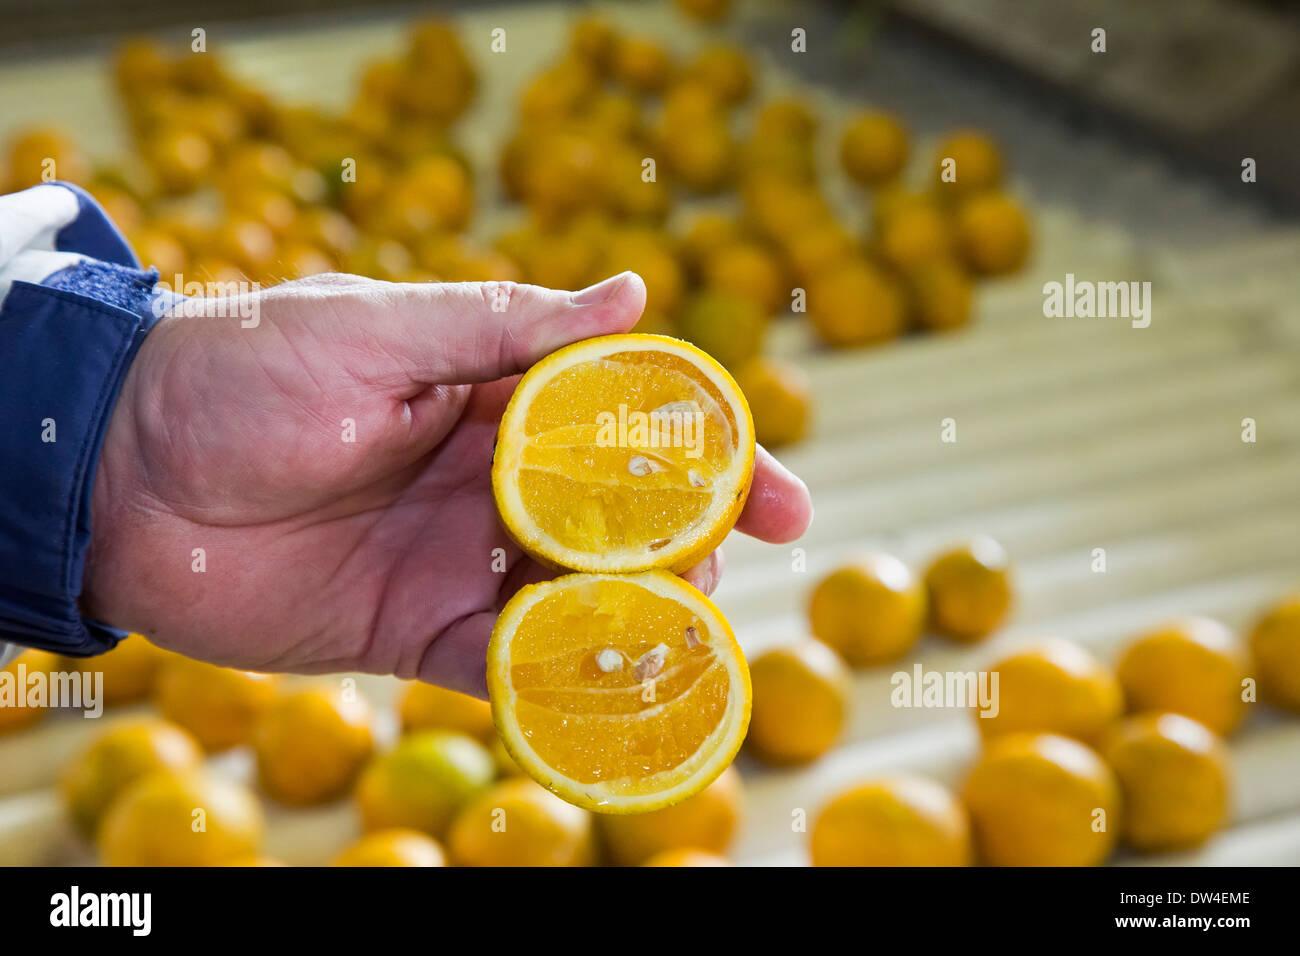 Vero Beach, Florida - An orange infected with citrus greening disease. - Stock Image